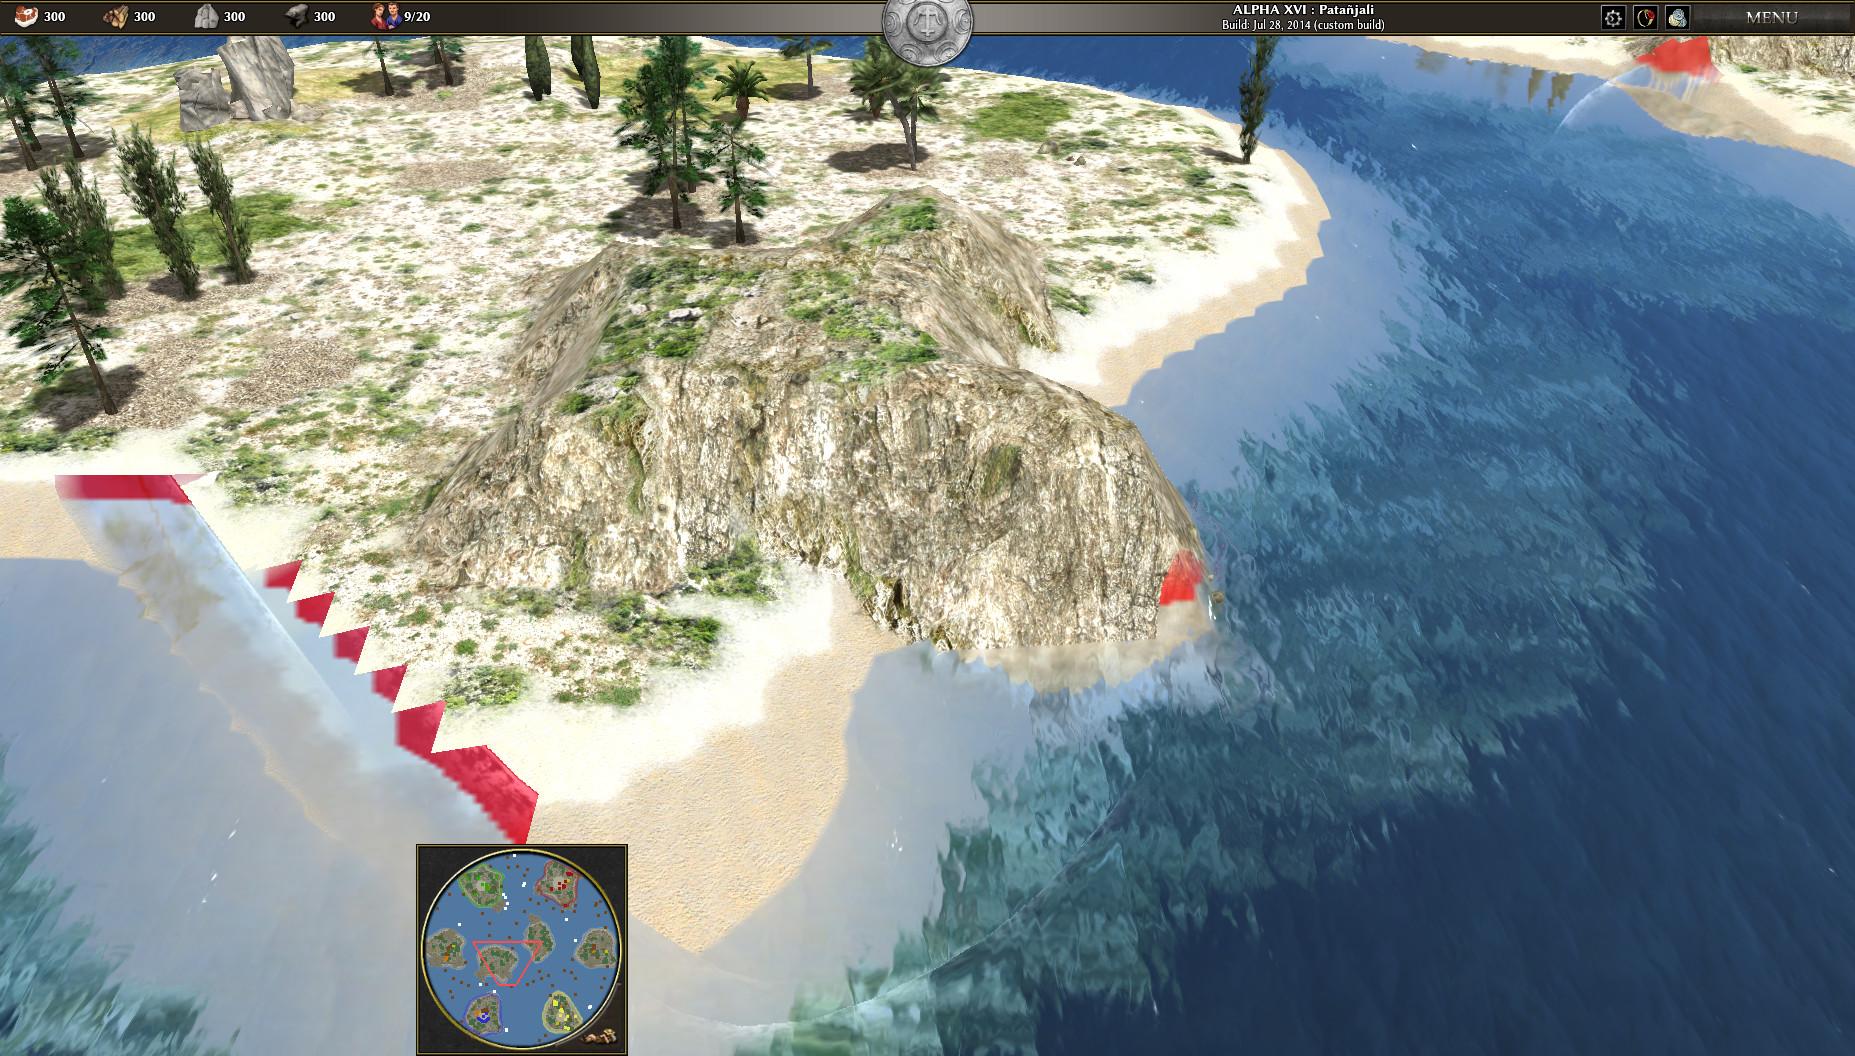 http://trac.wildfiregames.com/raw-attachment/ticket/2692/screenshot0015.jpg